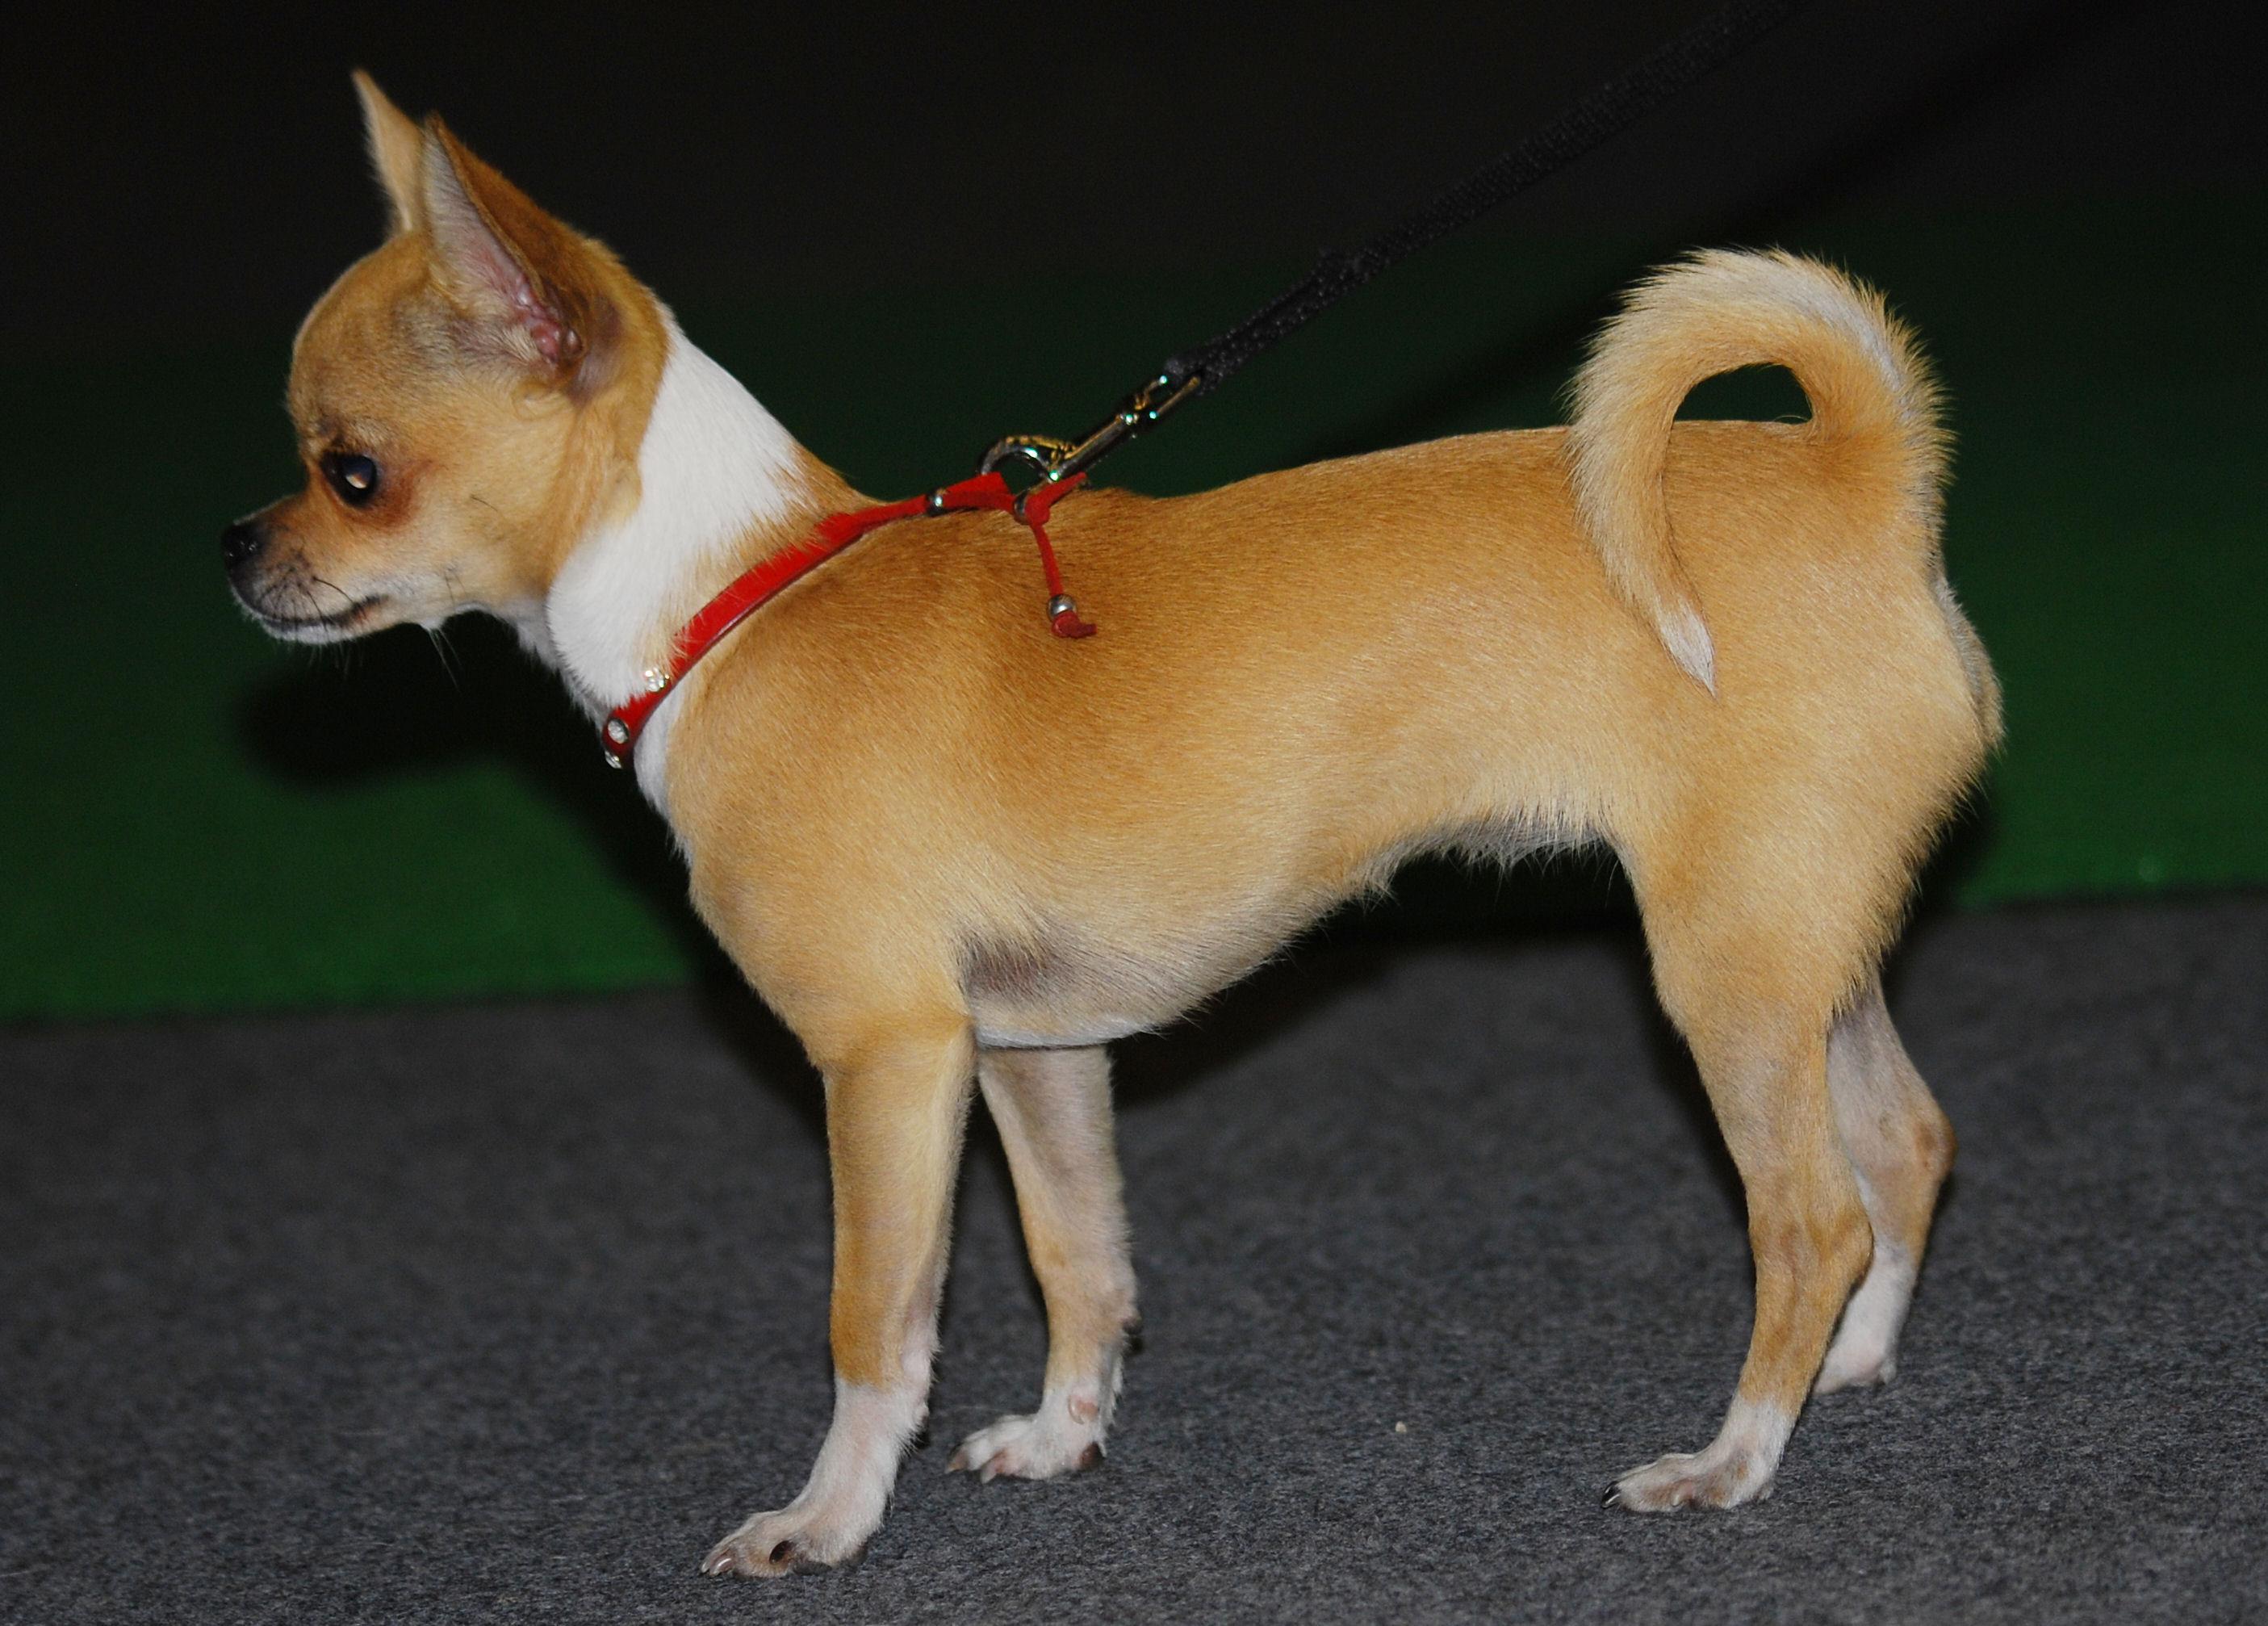 File:Chihuahua 01 K.jpg - Wikimedia Commons